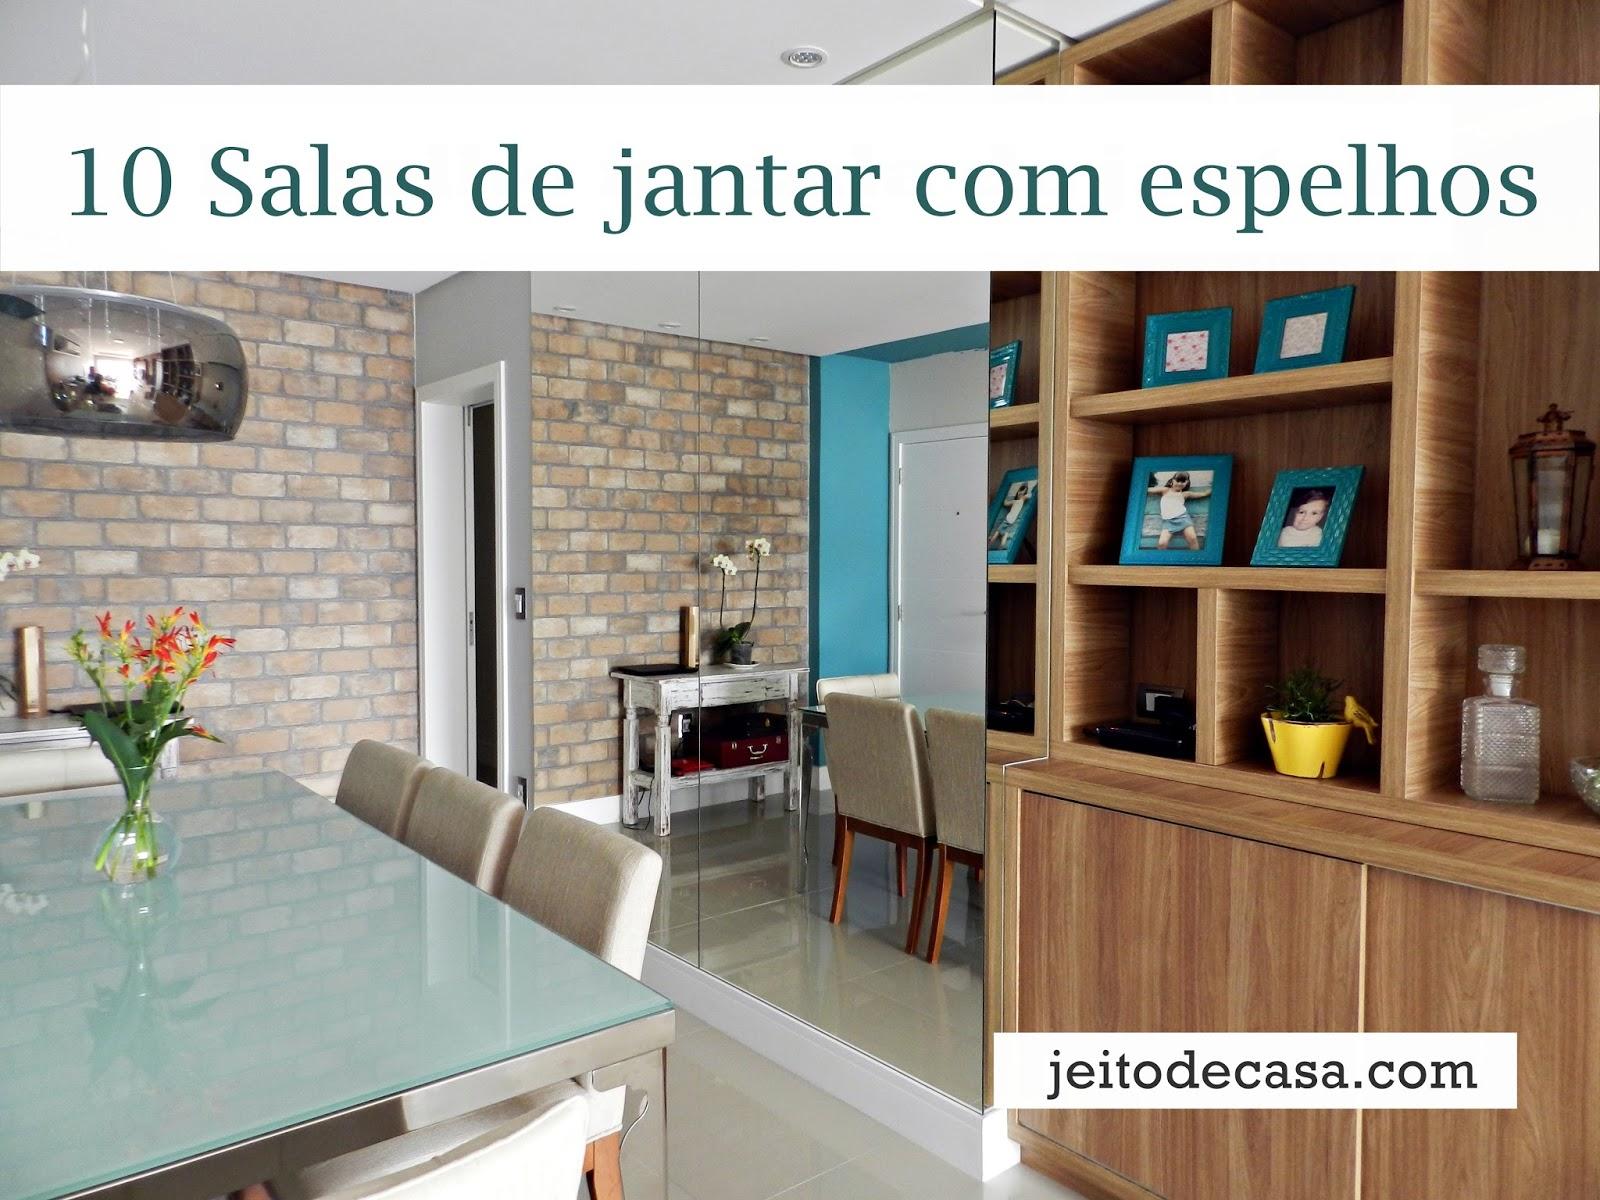 Decorao Sala De Jantar Pequena Simples Decorao Sala De Jantar